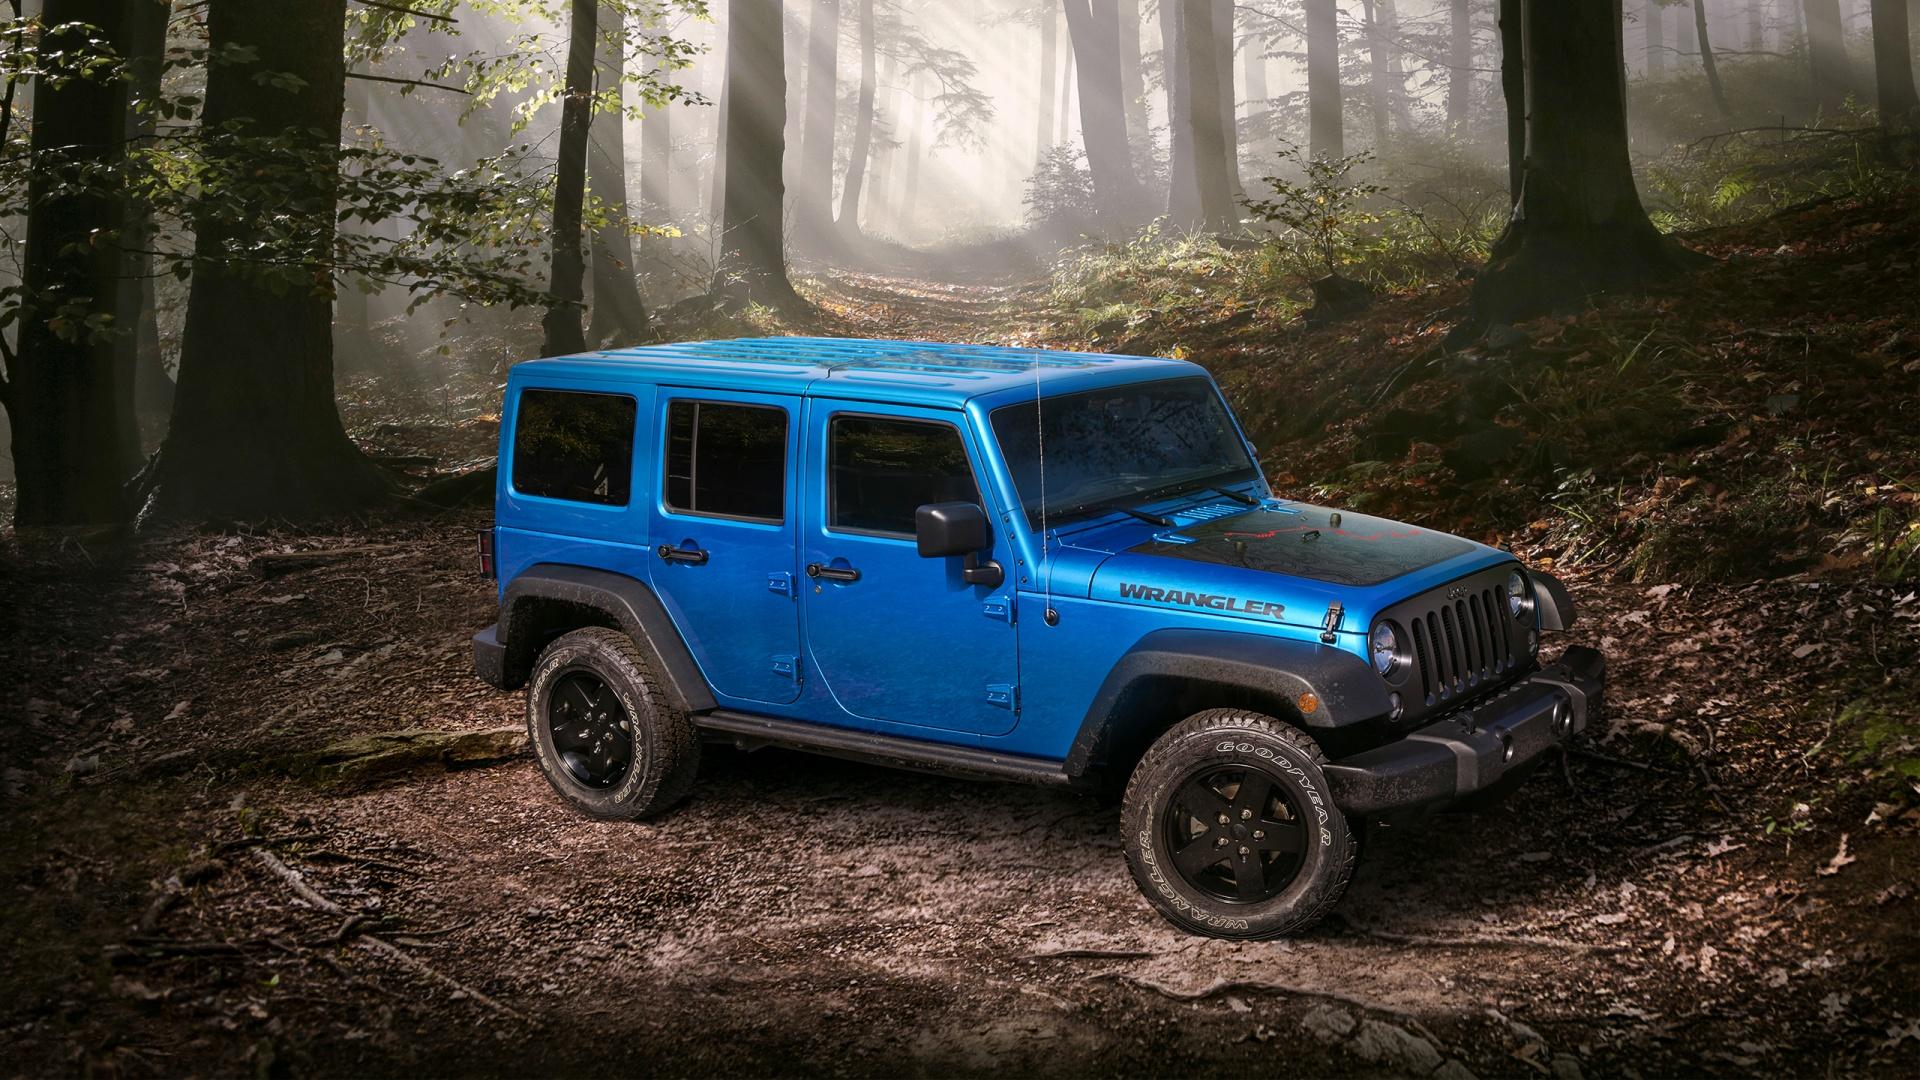 2015 Jeep Wrangler Wallpaper HD Car Wallpapers 1920x1080